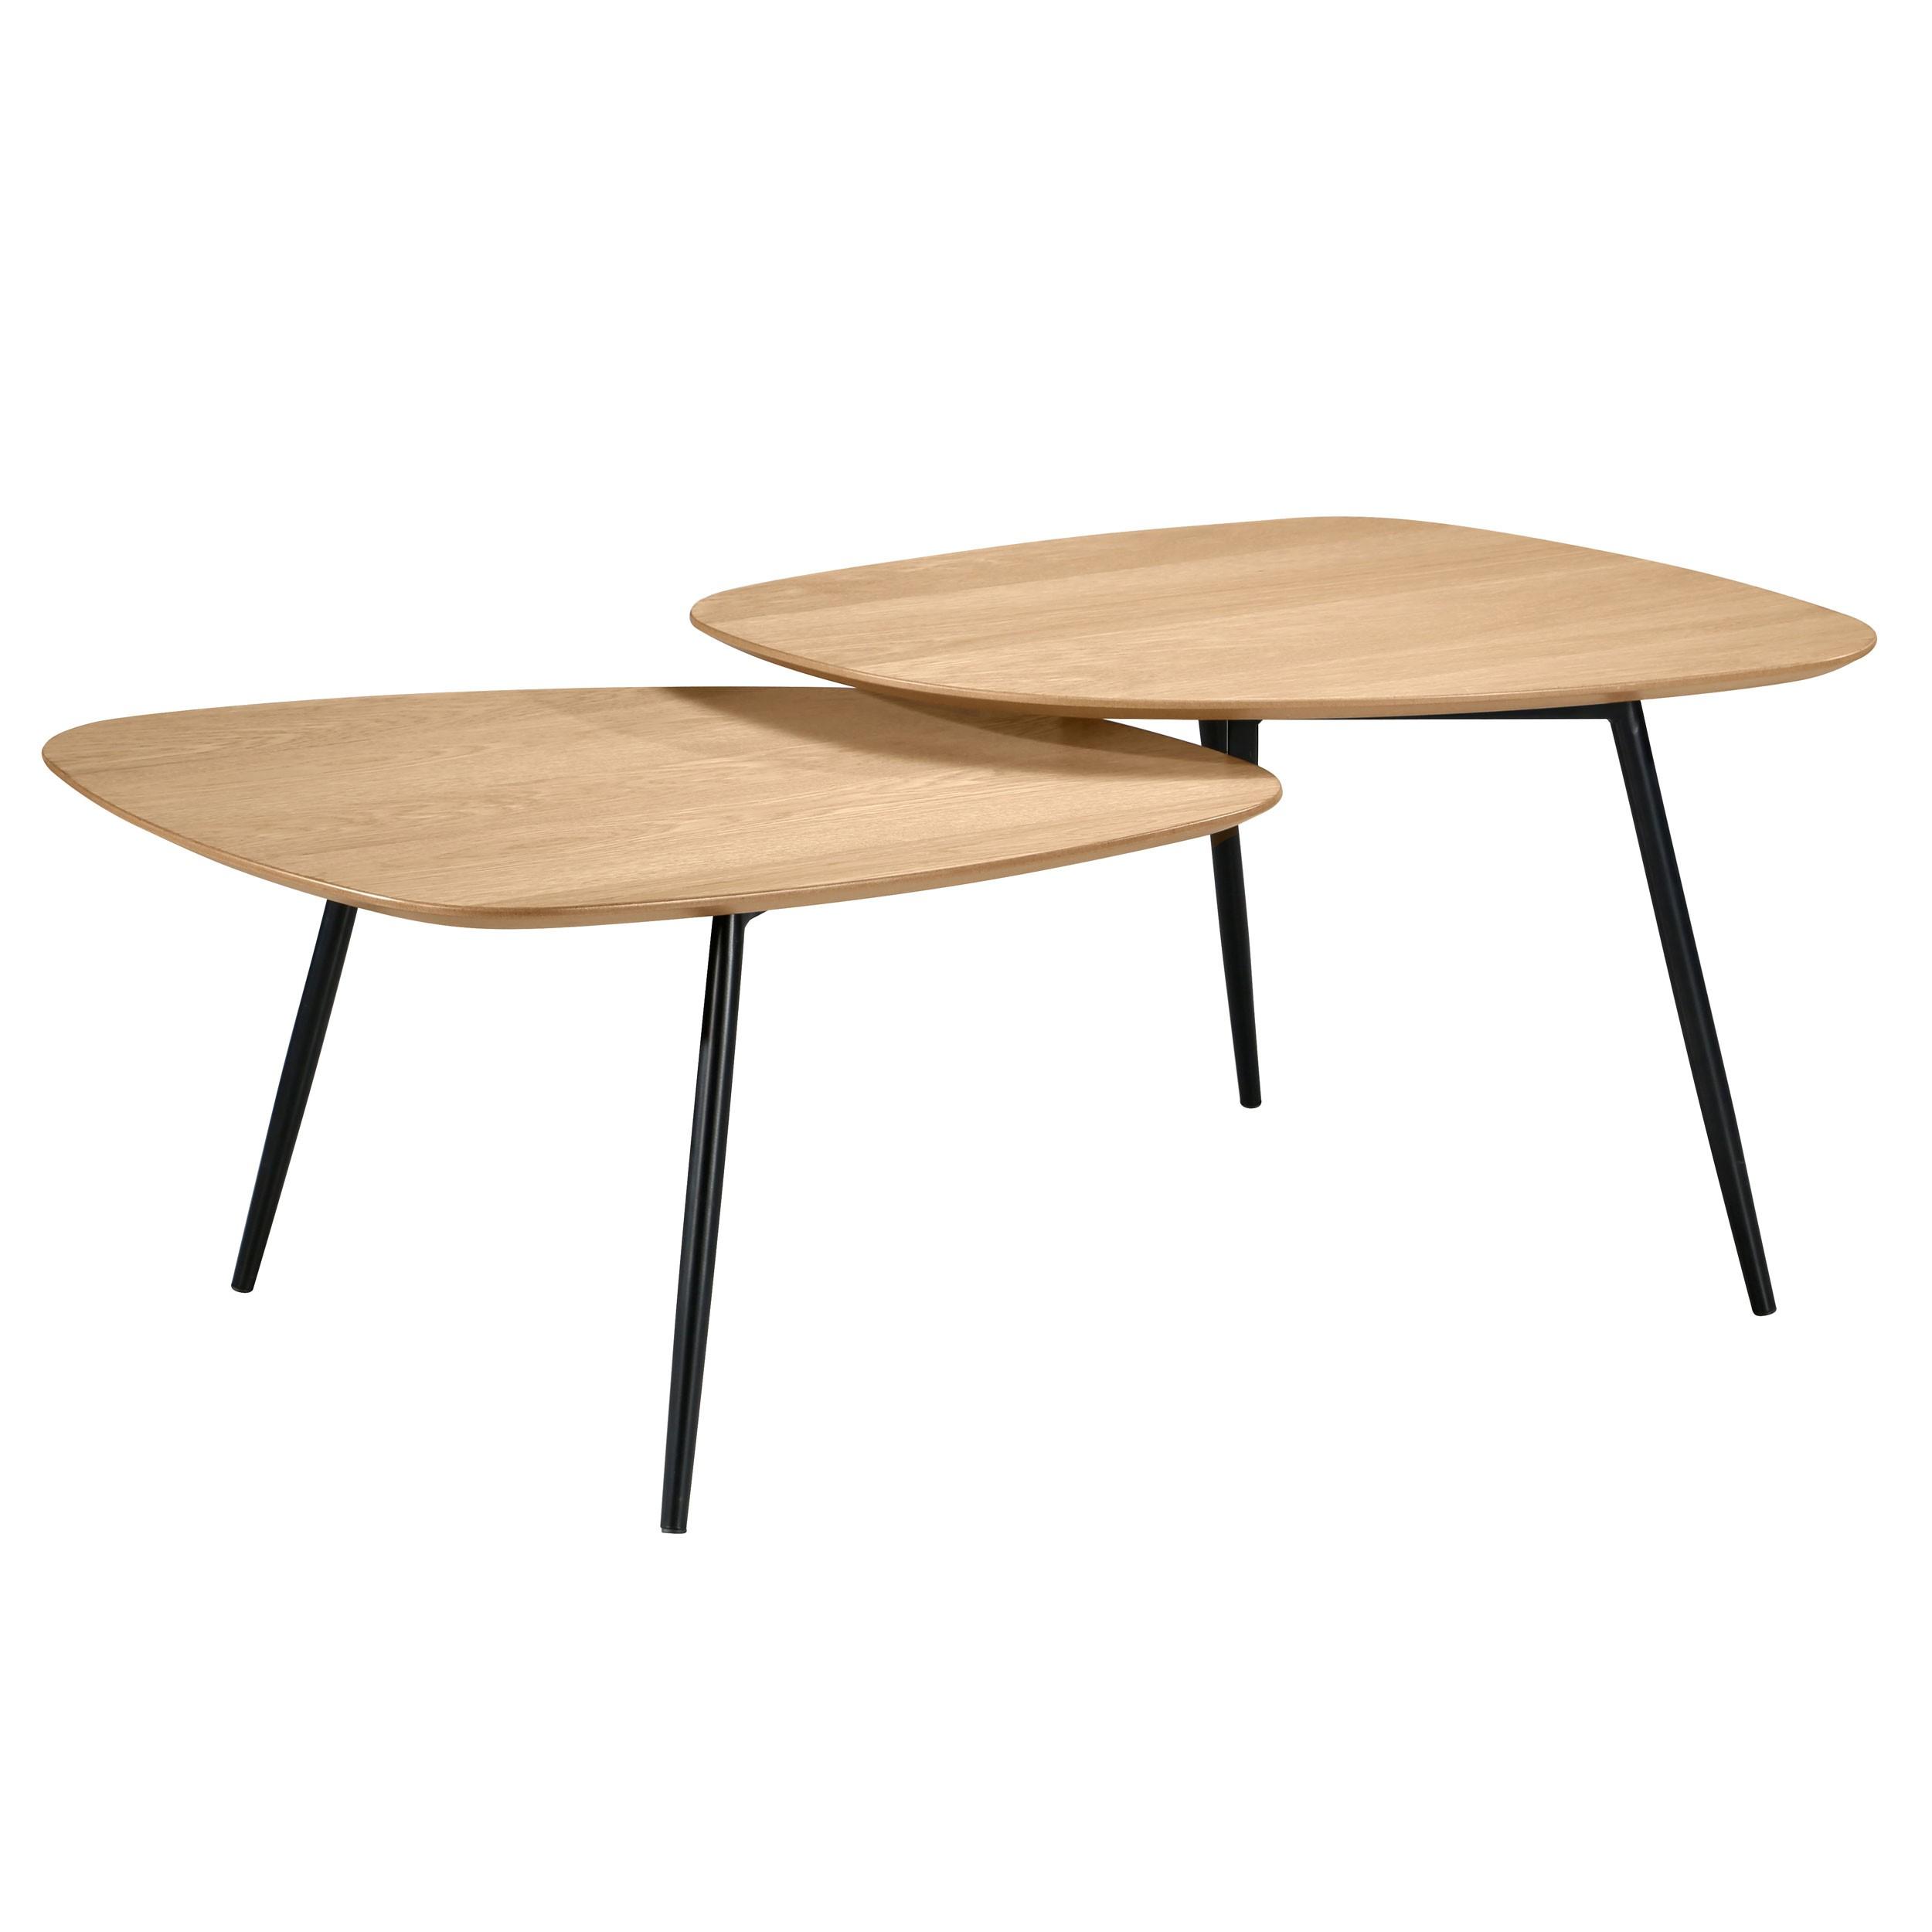 table basse loken commandez les tables basses loken design rdv d co. Black Bedroom Furniture Sets. Home Design Ideas